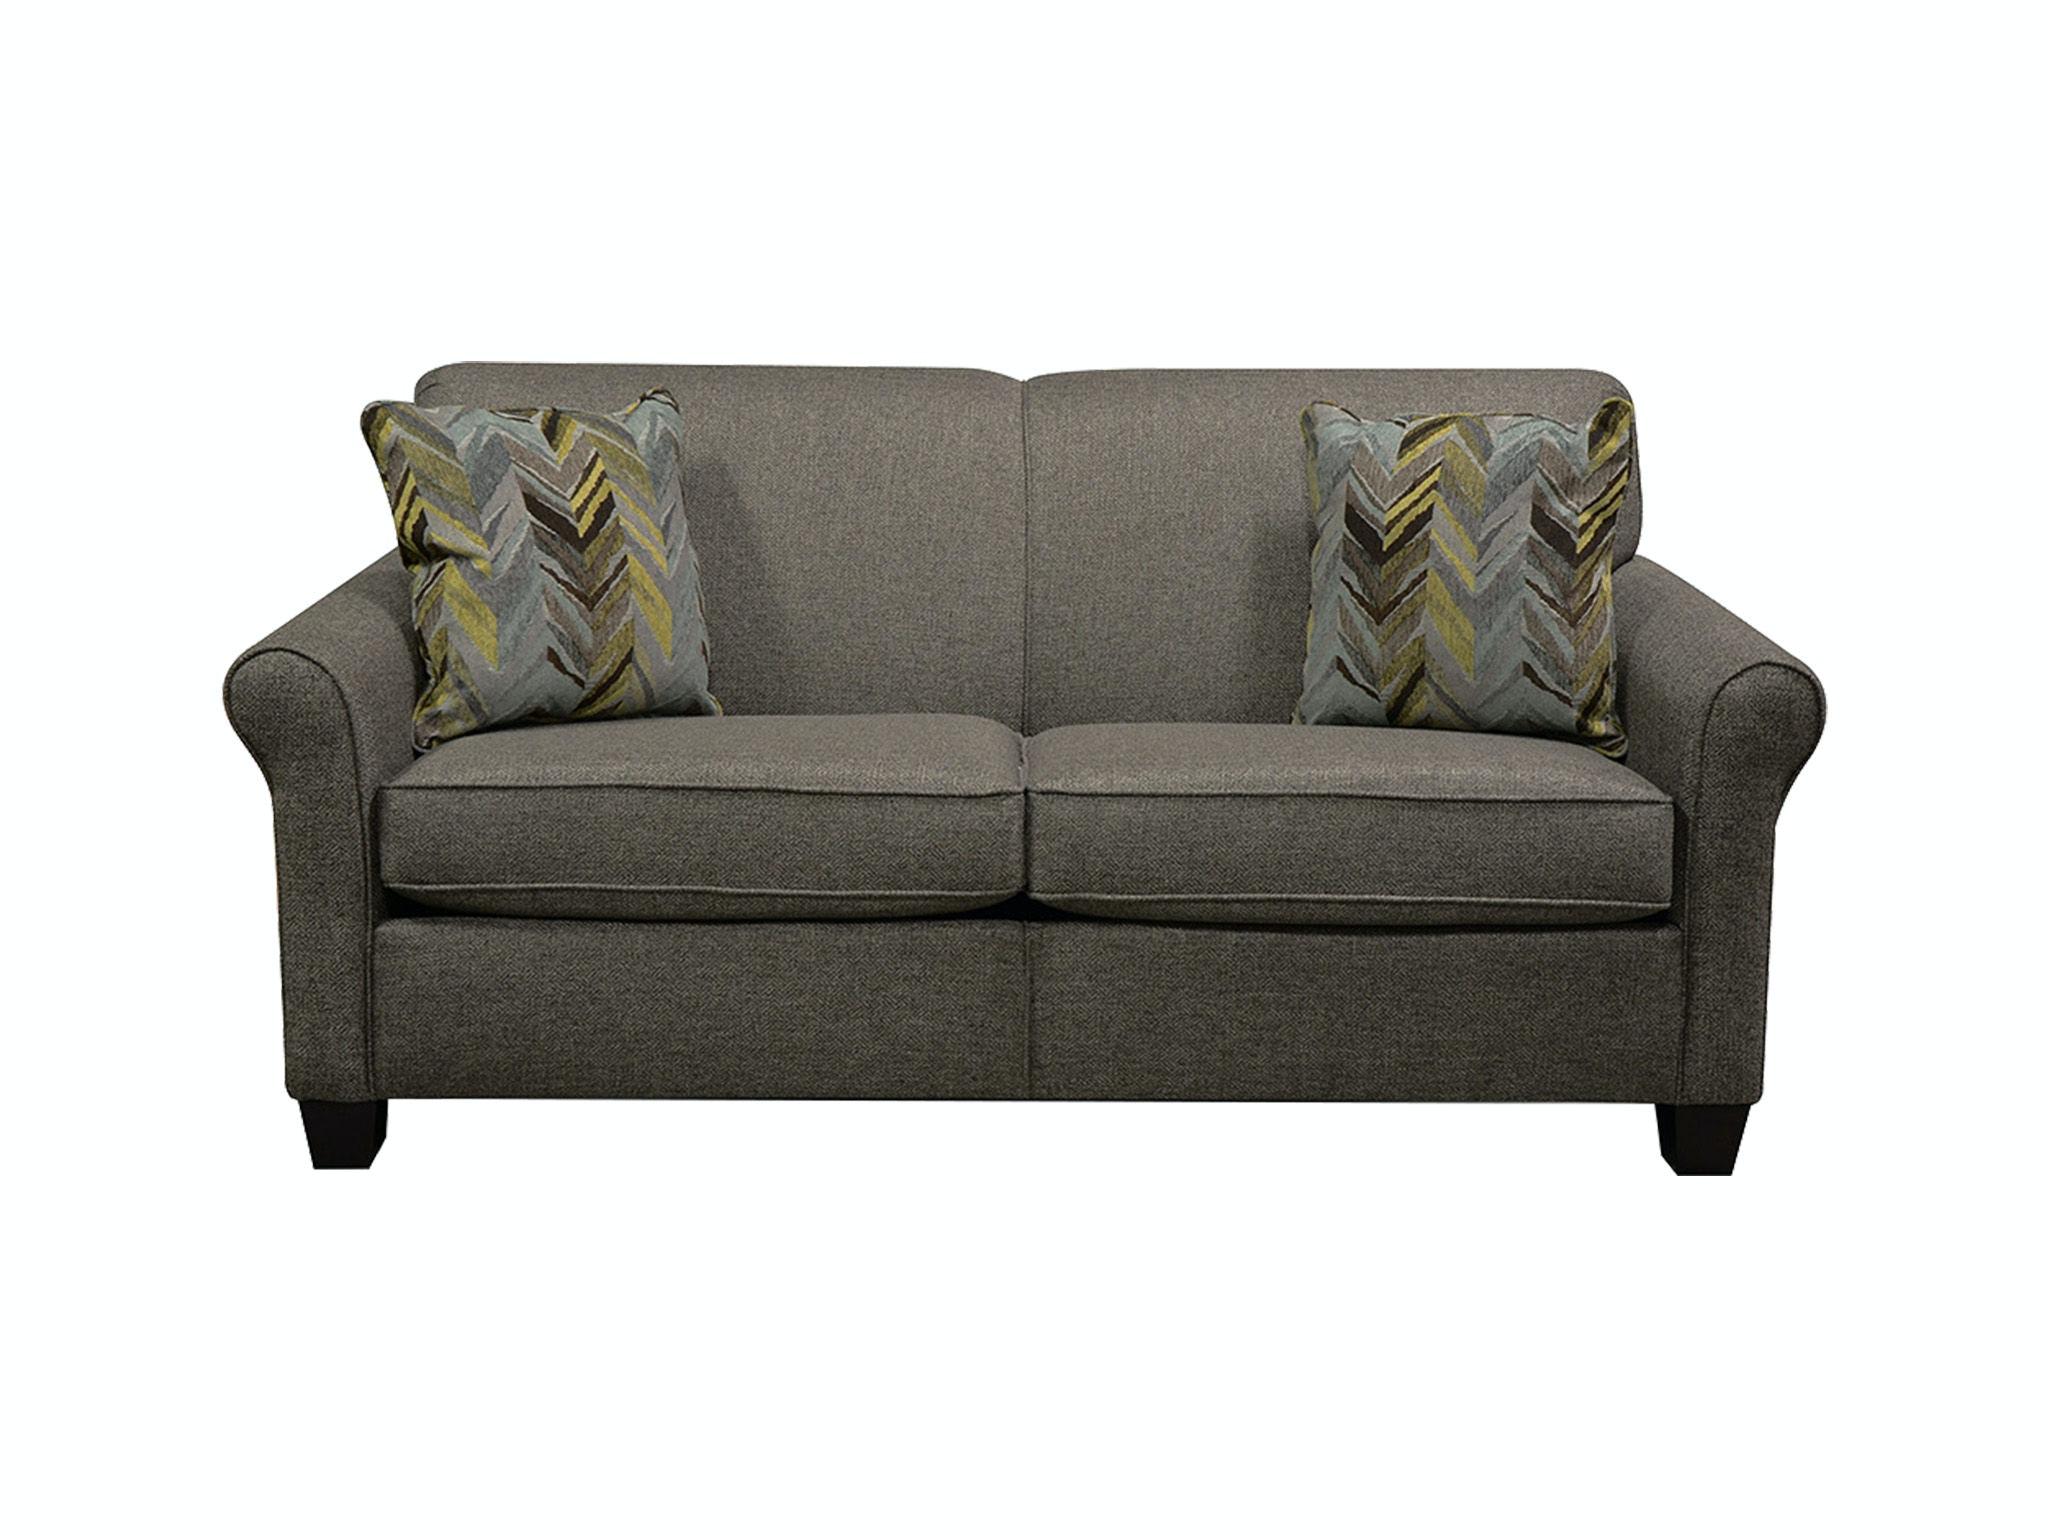 davis leather twin sleeper sofa bubba triple reclining england living room angie full 4638